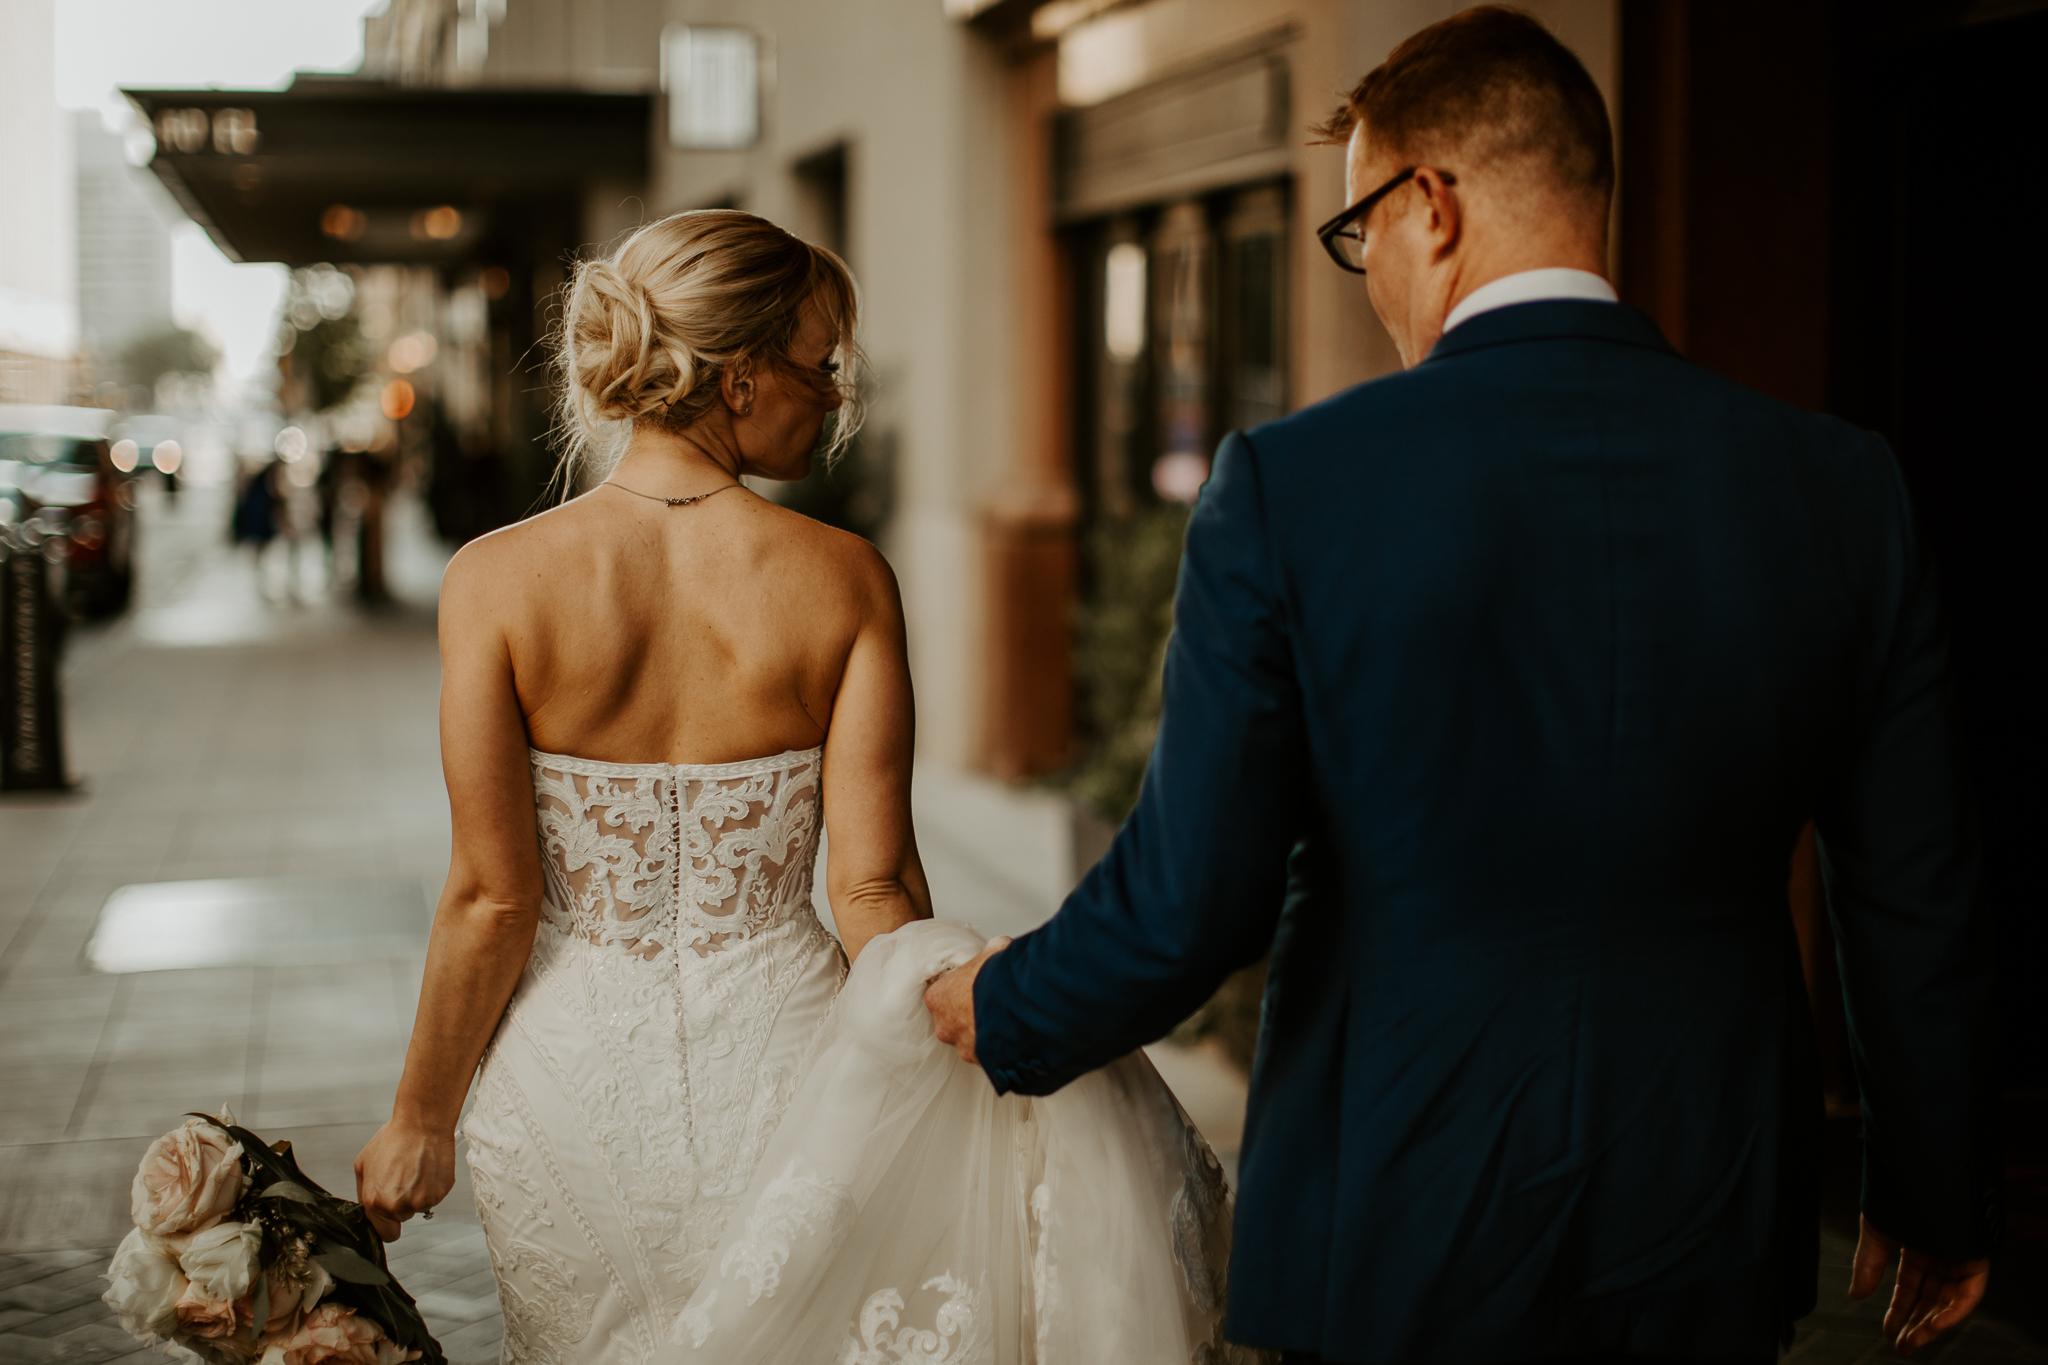 Laken-Mackenzie-Photography-Fort-Worth-Wedding-Photographer-DFW-Wedding-Photographer (3 of 6)-2.jpg